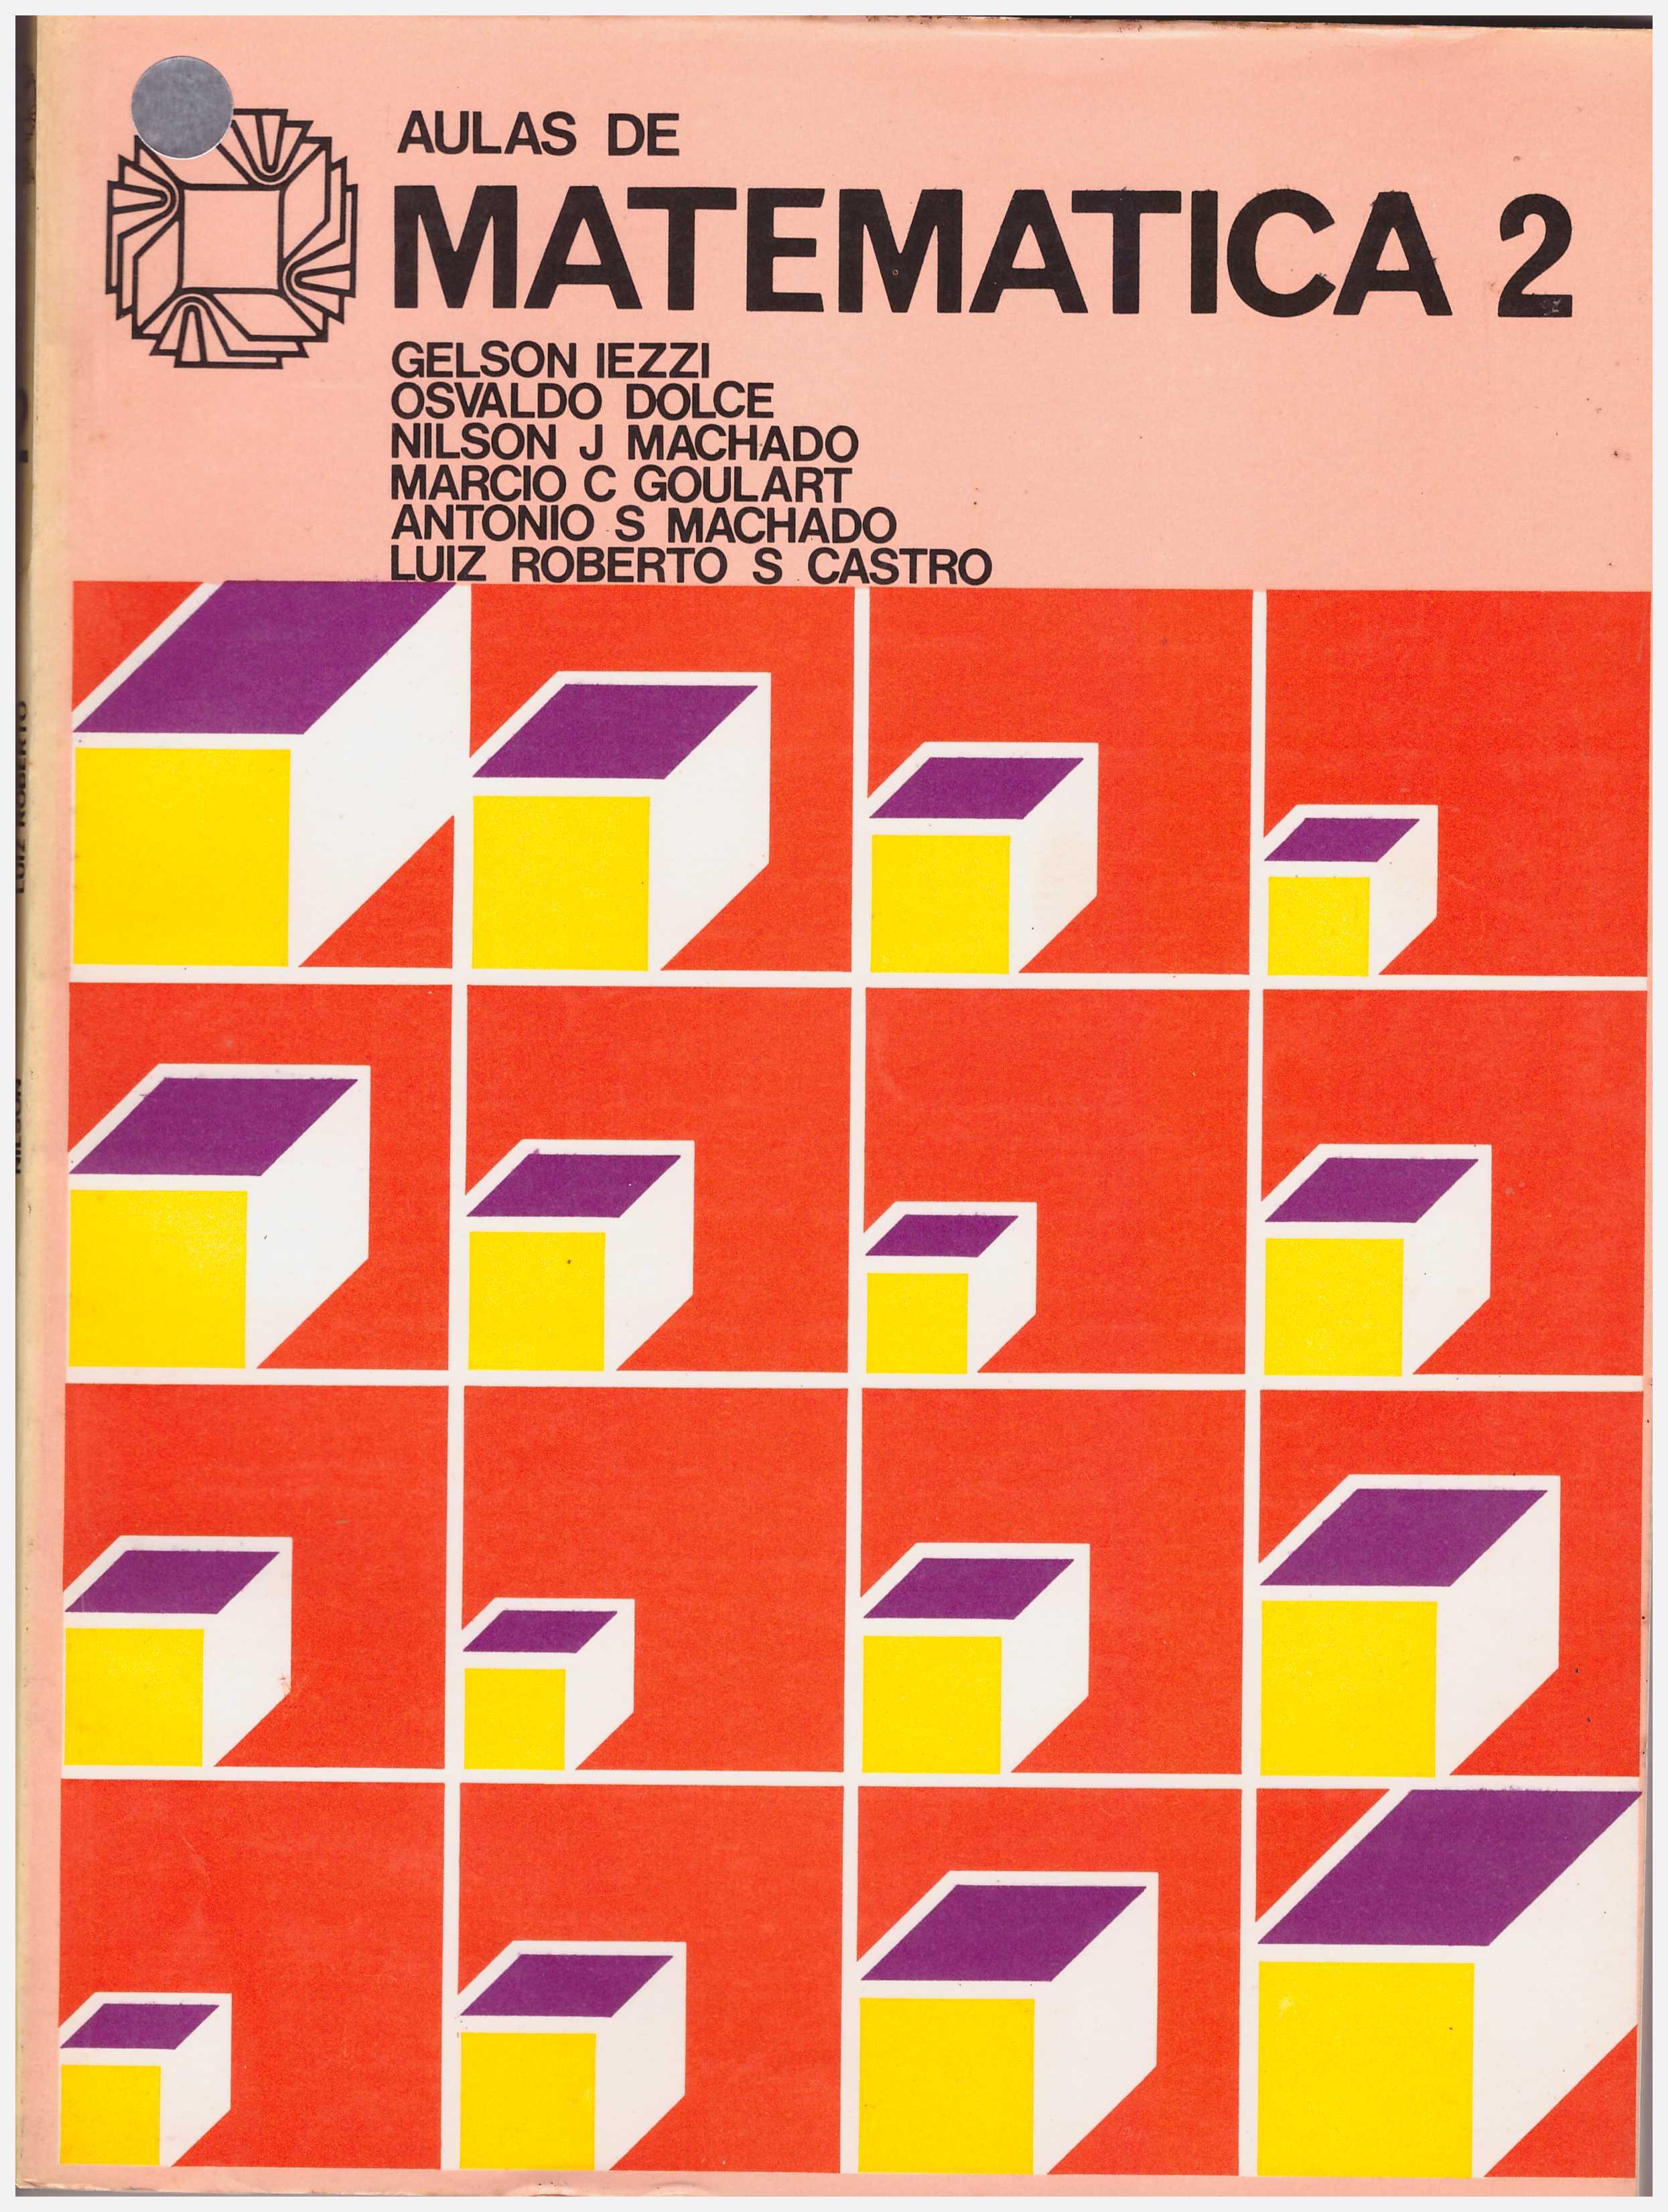 aulas-de-matematica-2